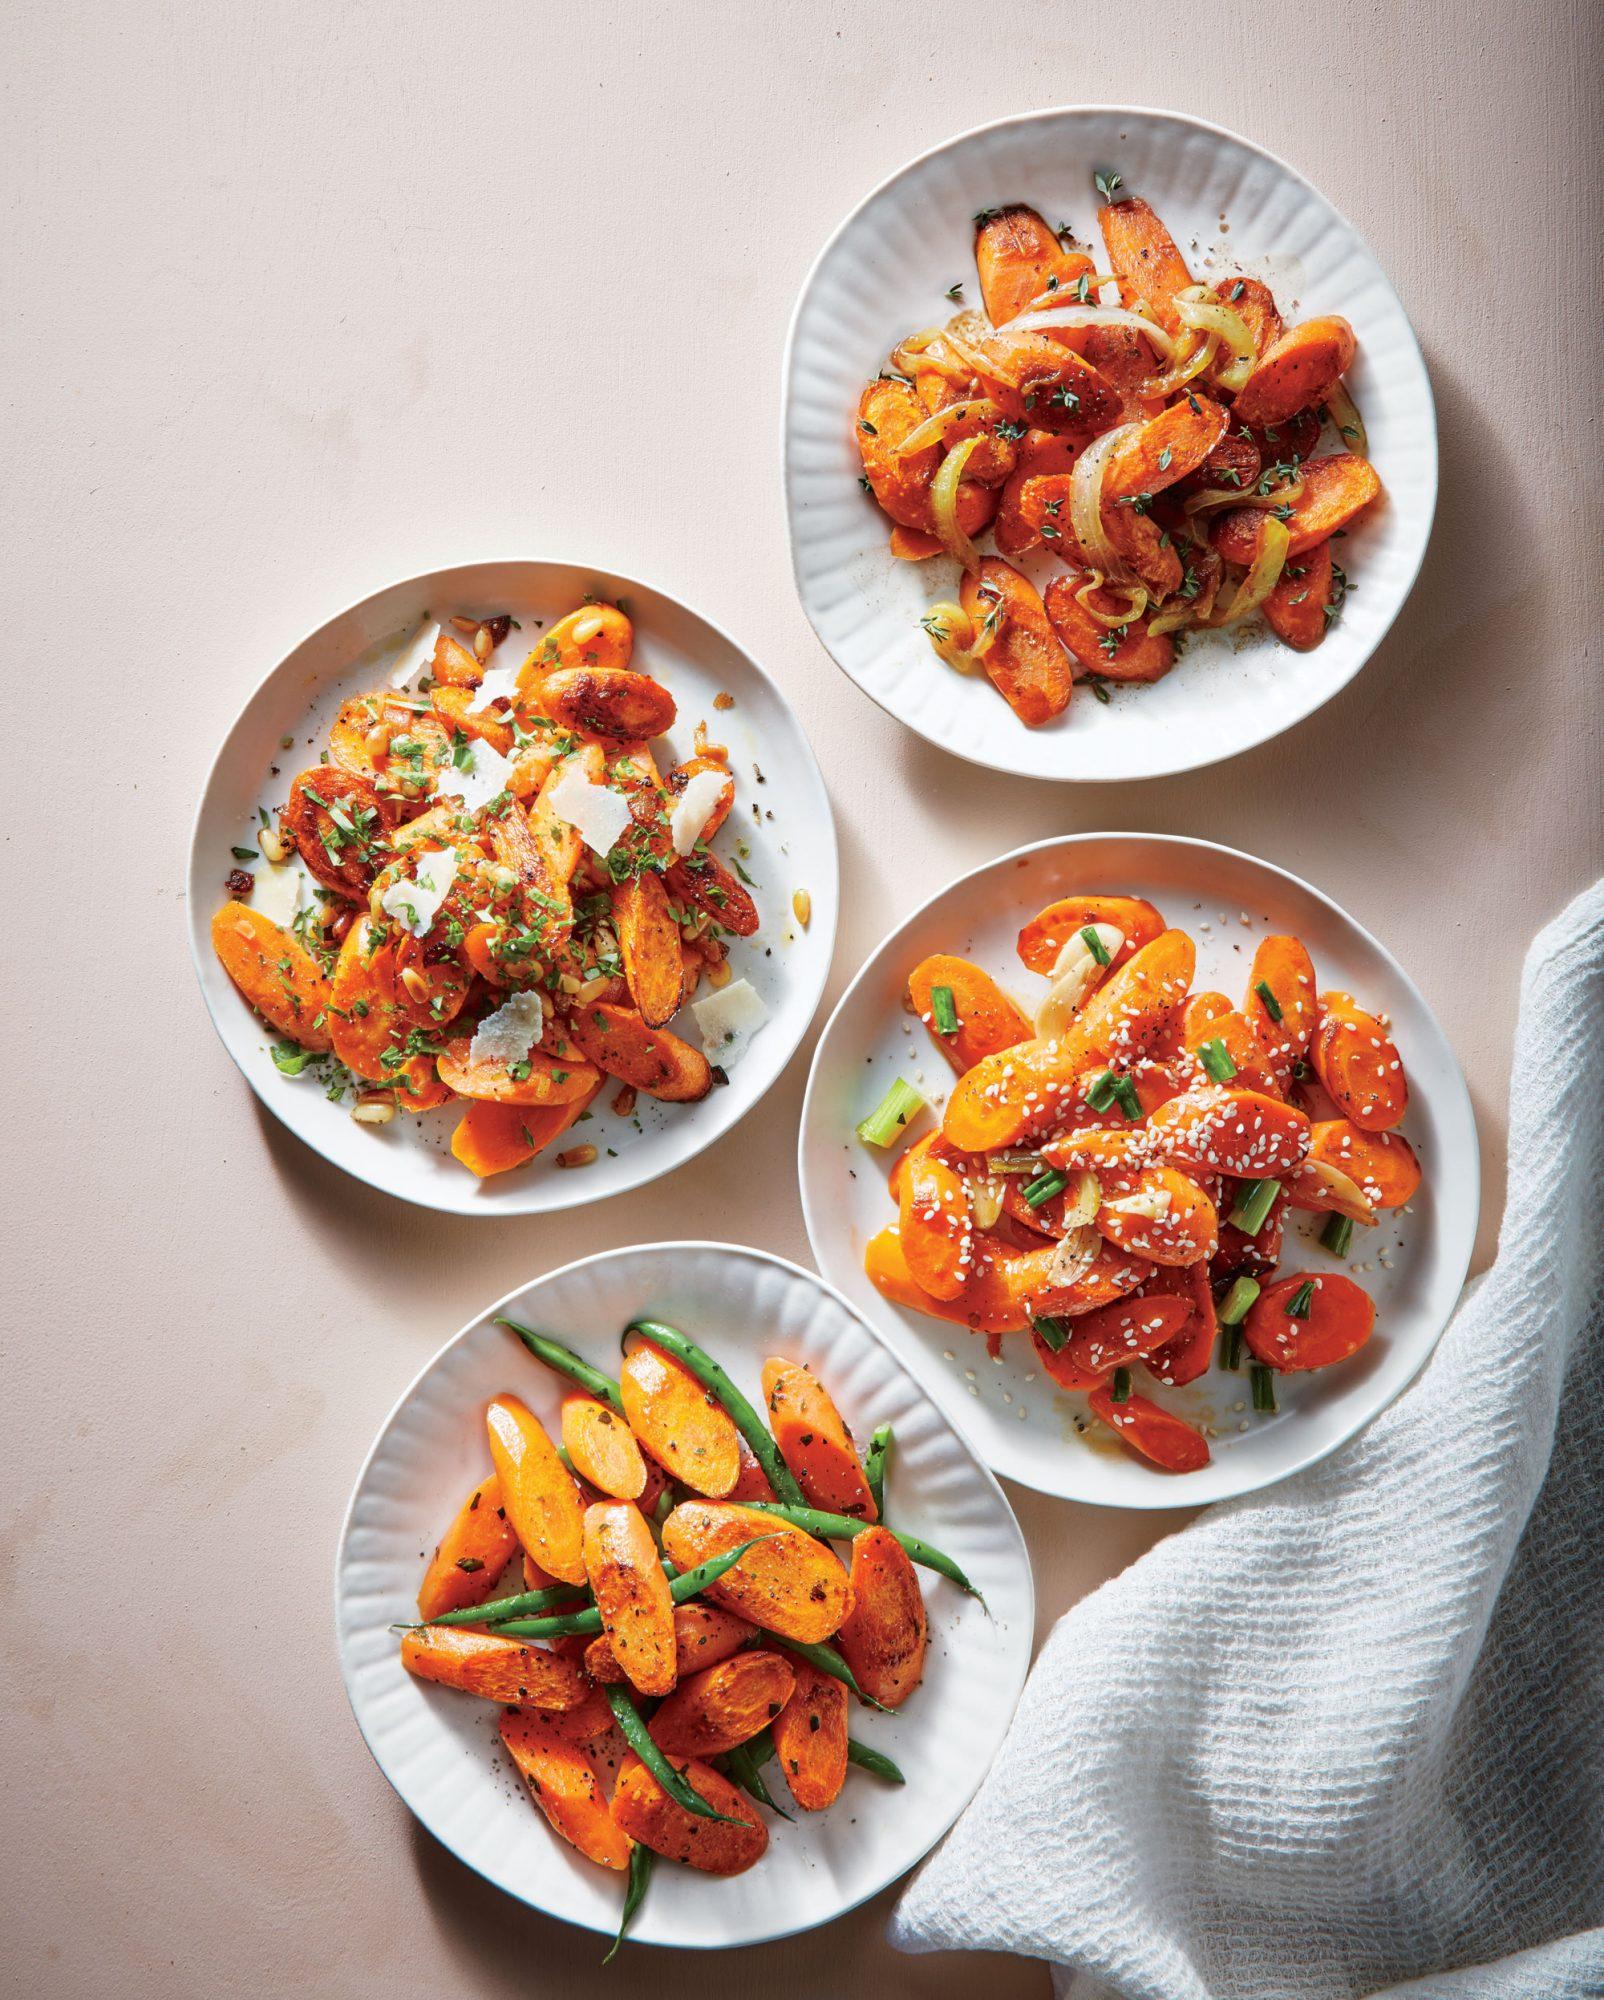 Parmesan Carrots with Lemon-Parsley Dressing